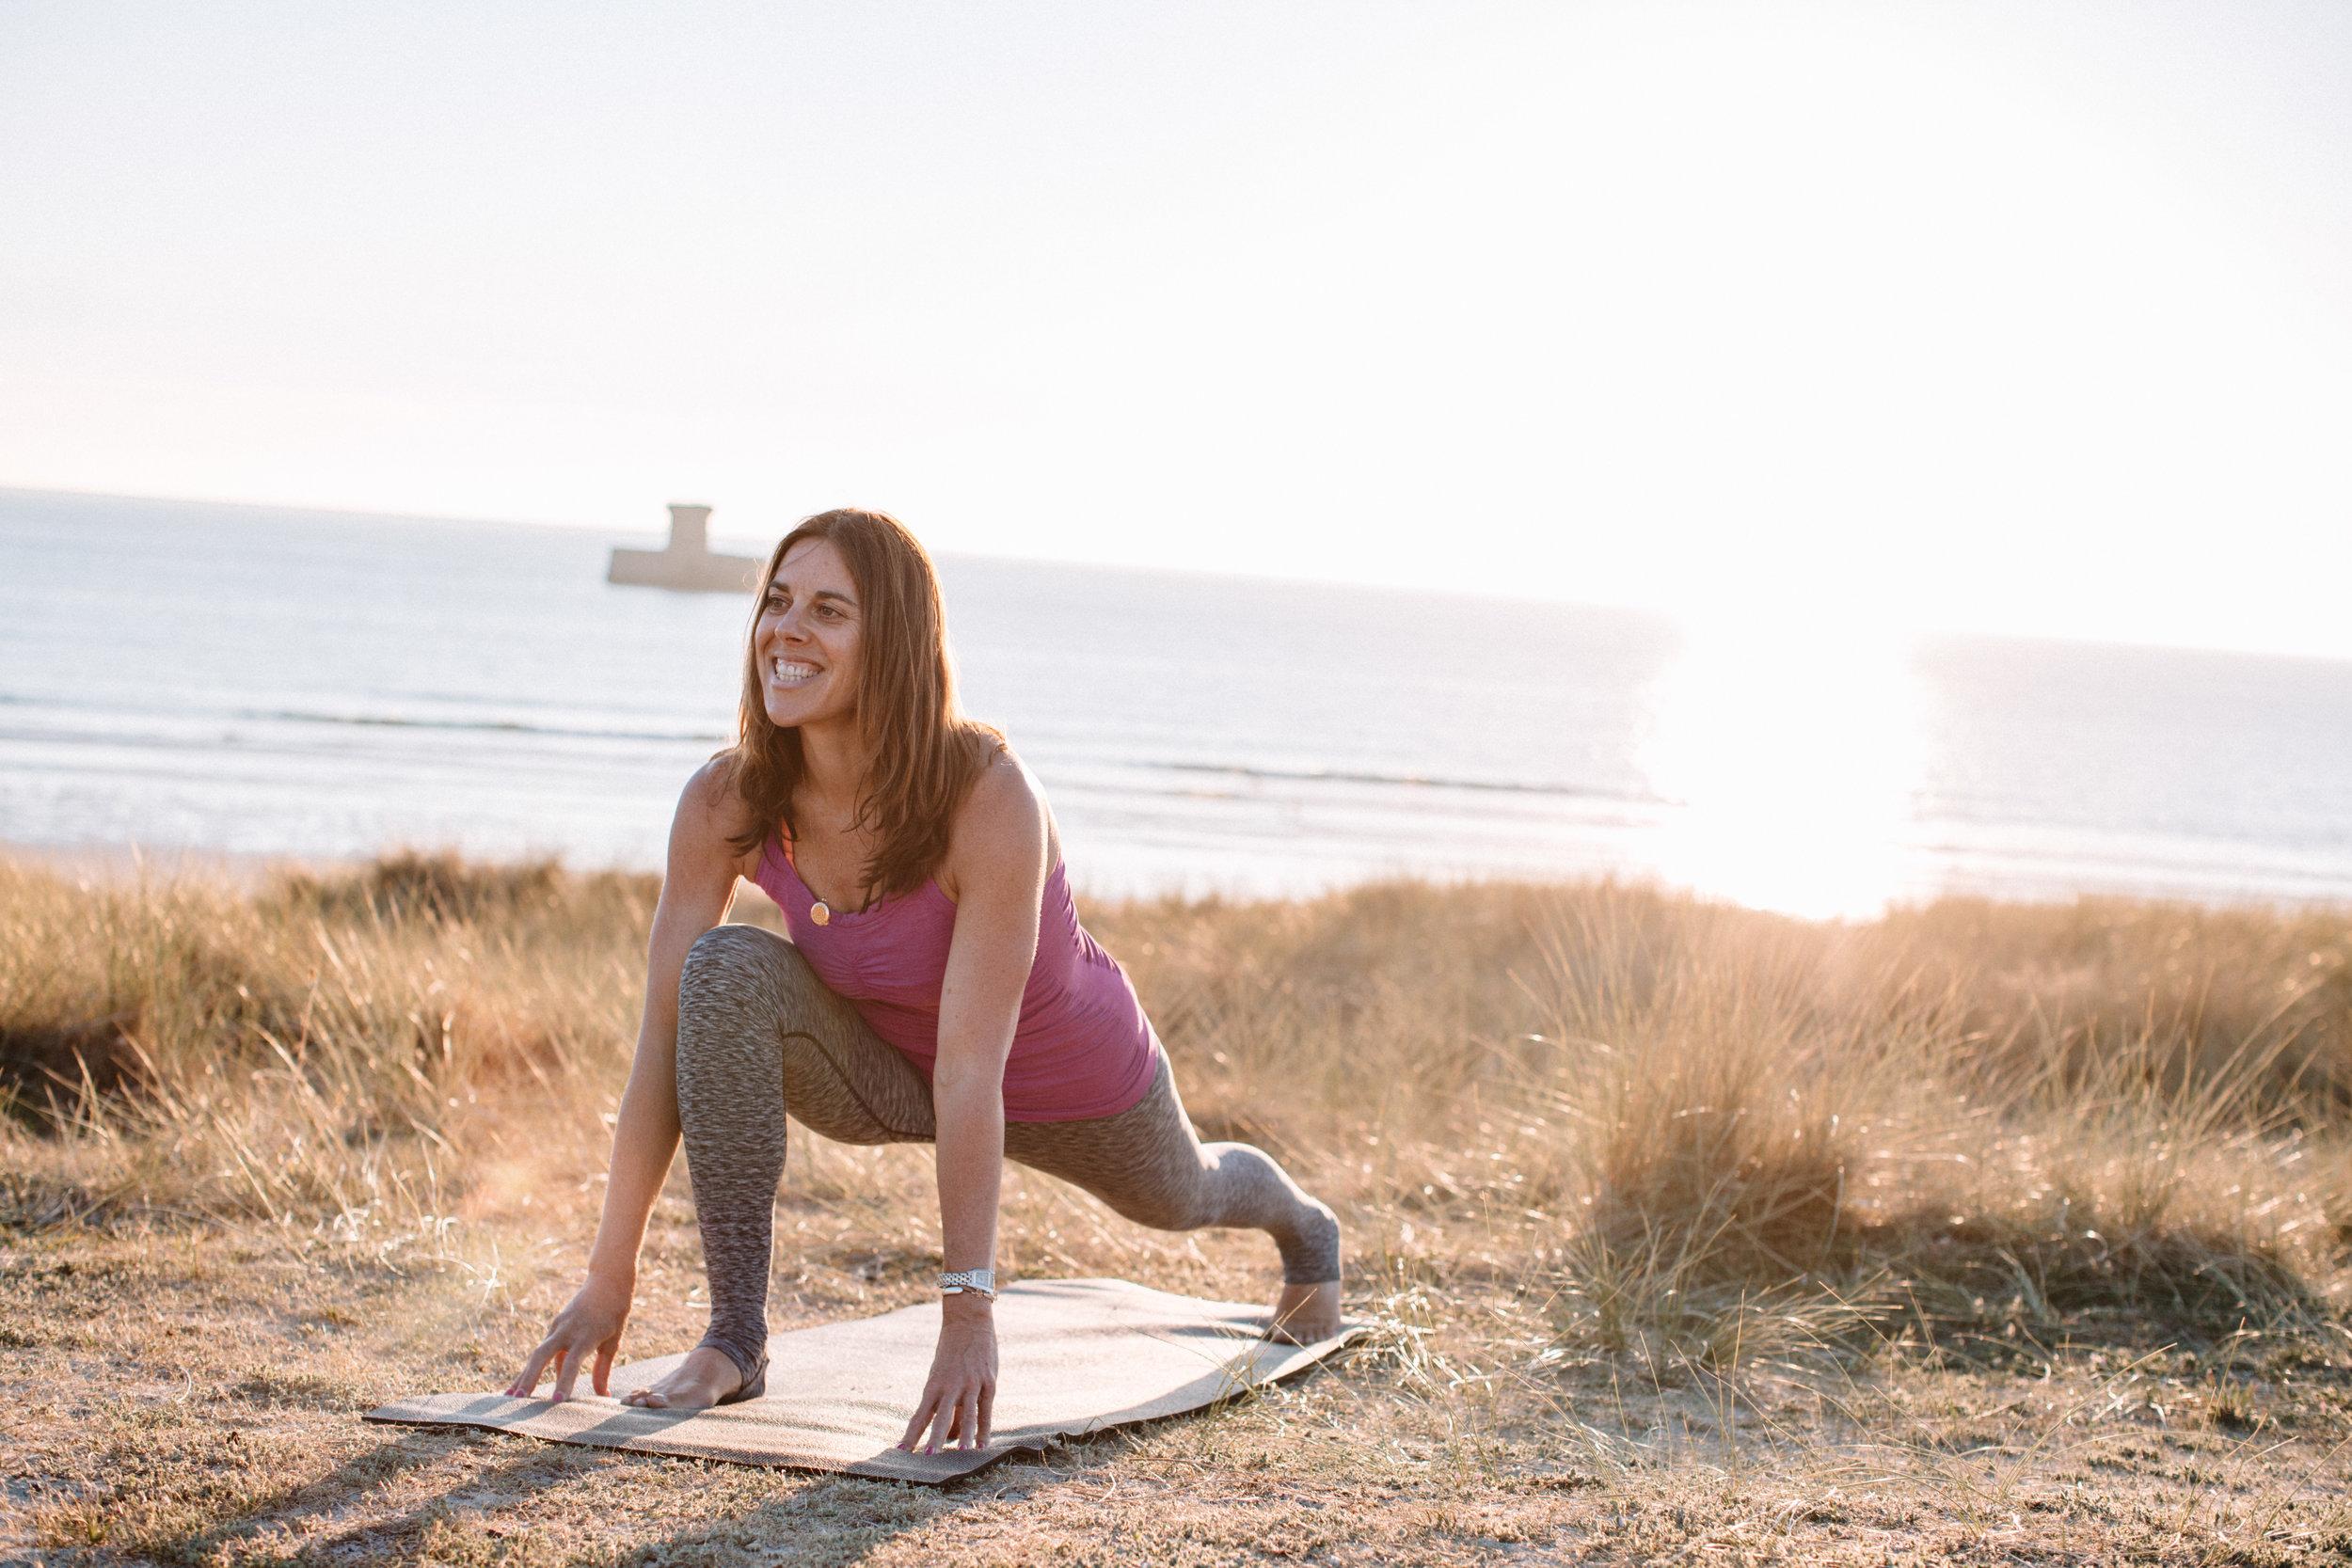 Amanda cassar yoga teacher and doTERRA essential oil educator